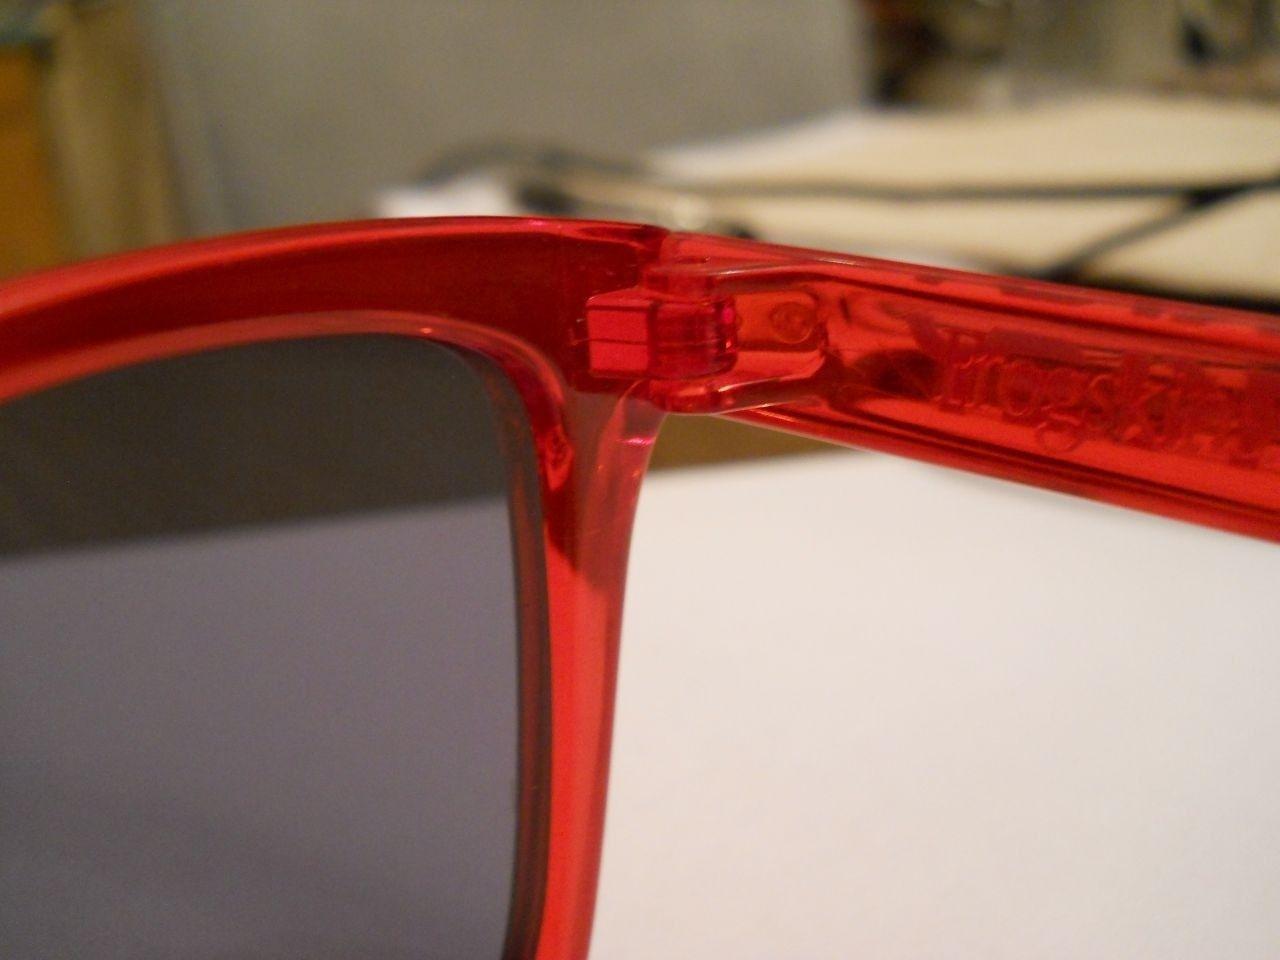 Crystal Red Frogskins - Real Or Fake? - 84cw.jpg